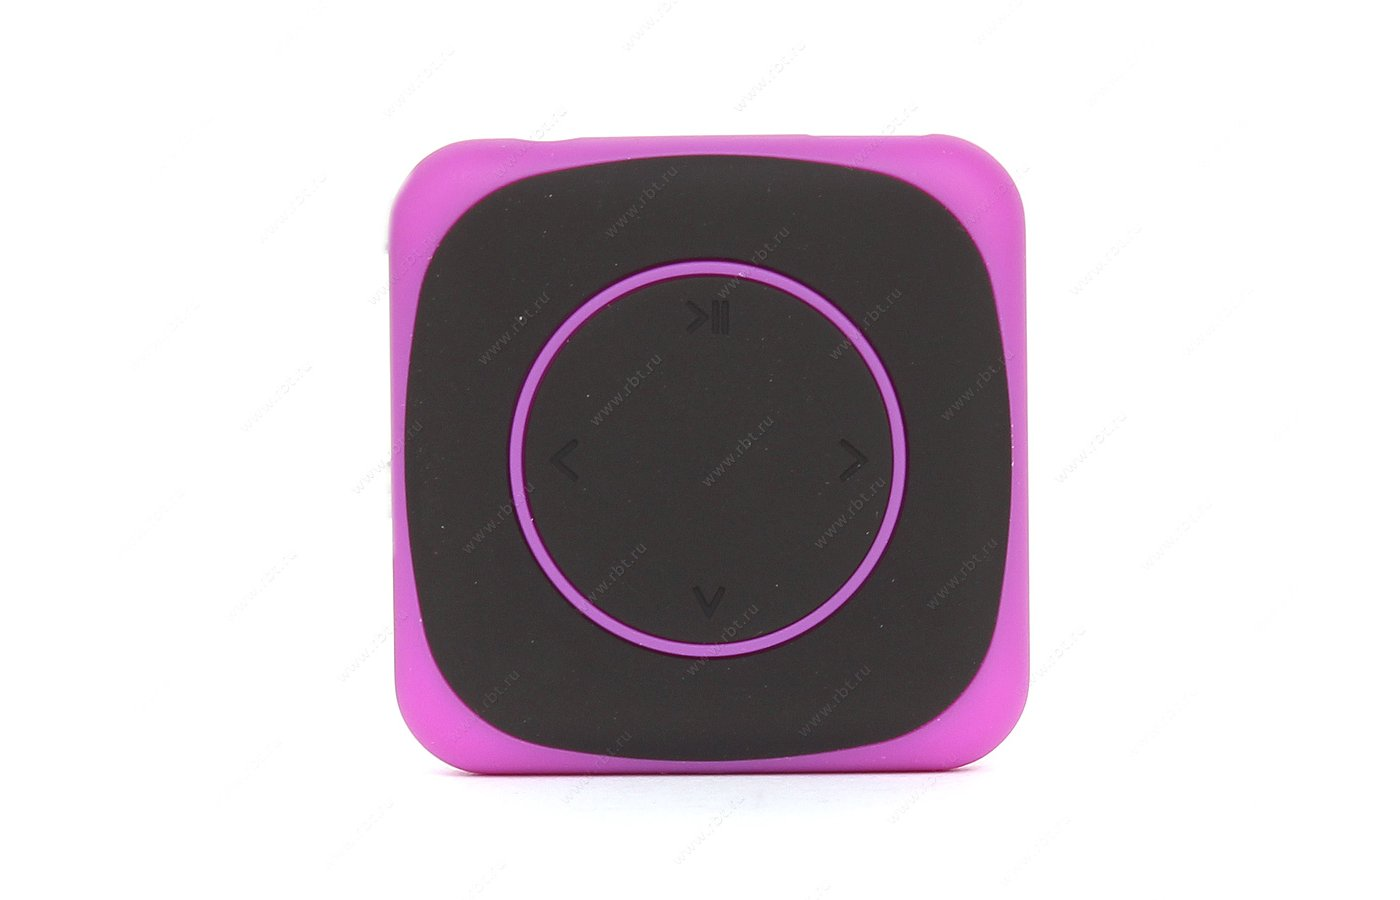 МР3 плеер TeXet T-3 4Gb фиолетовый